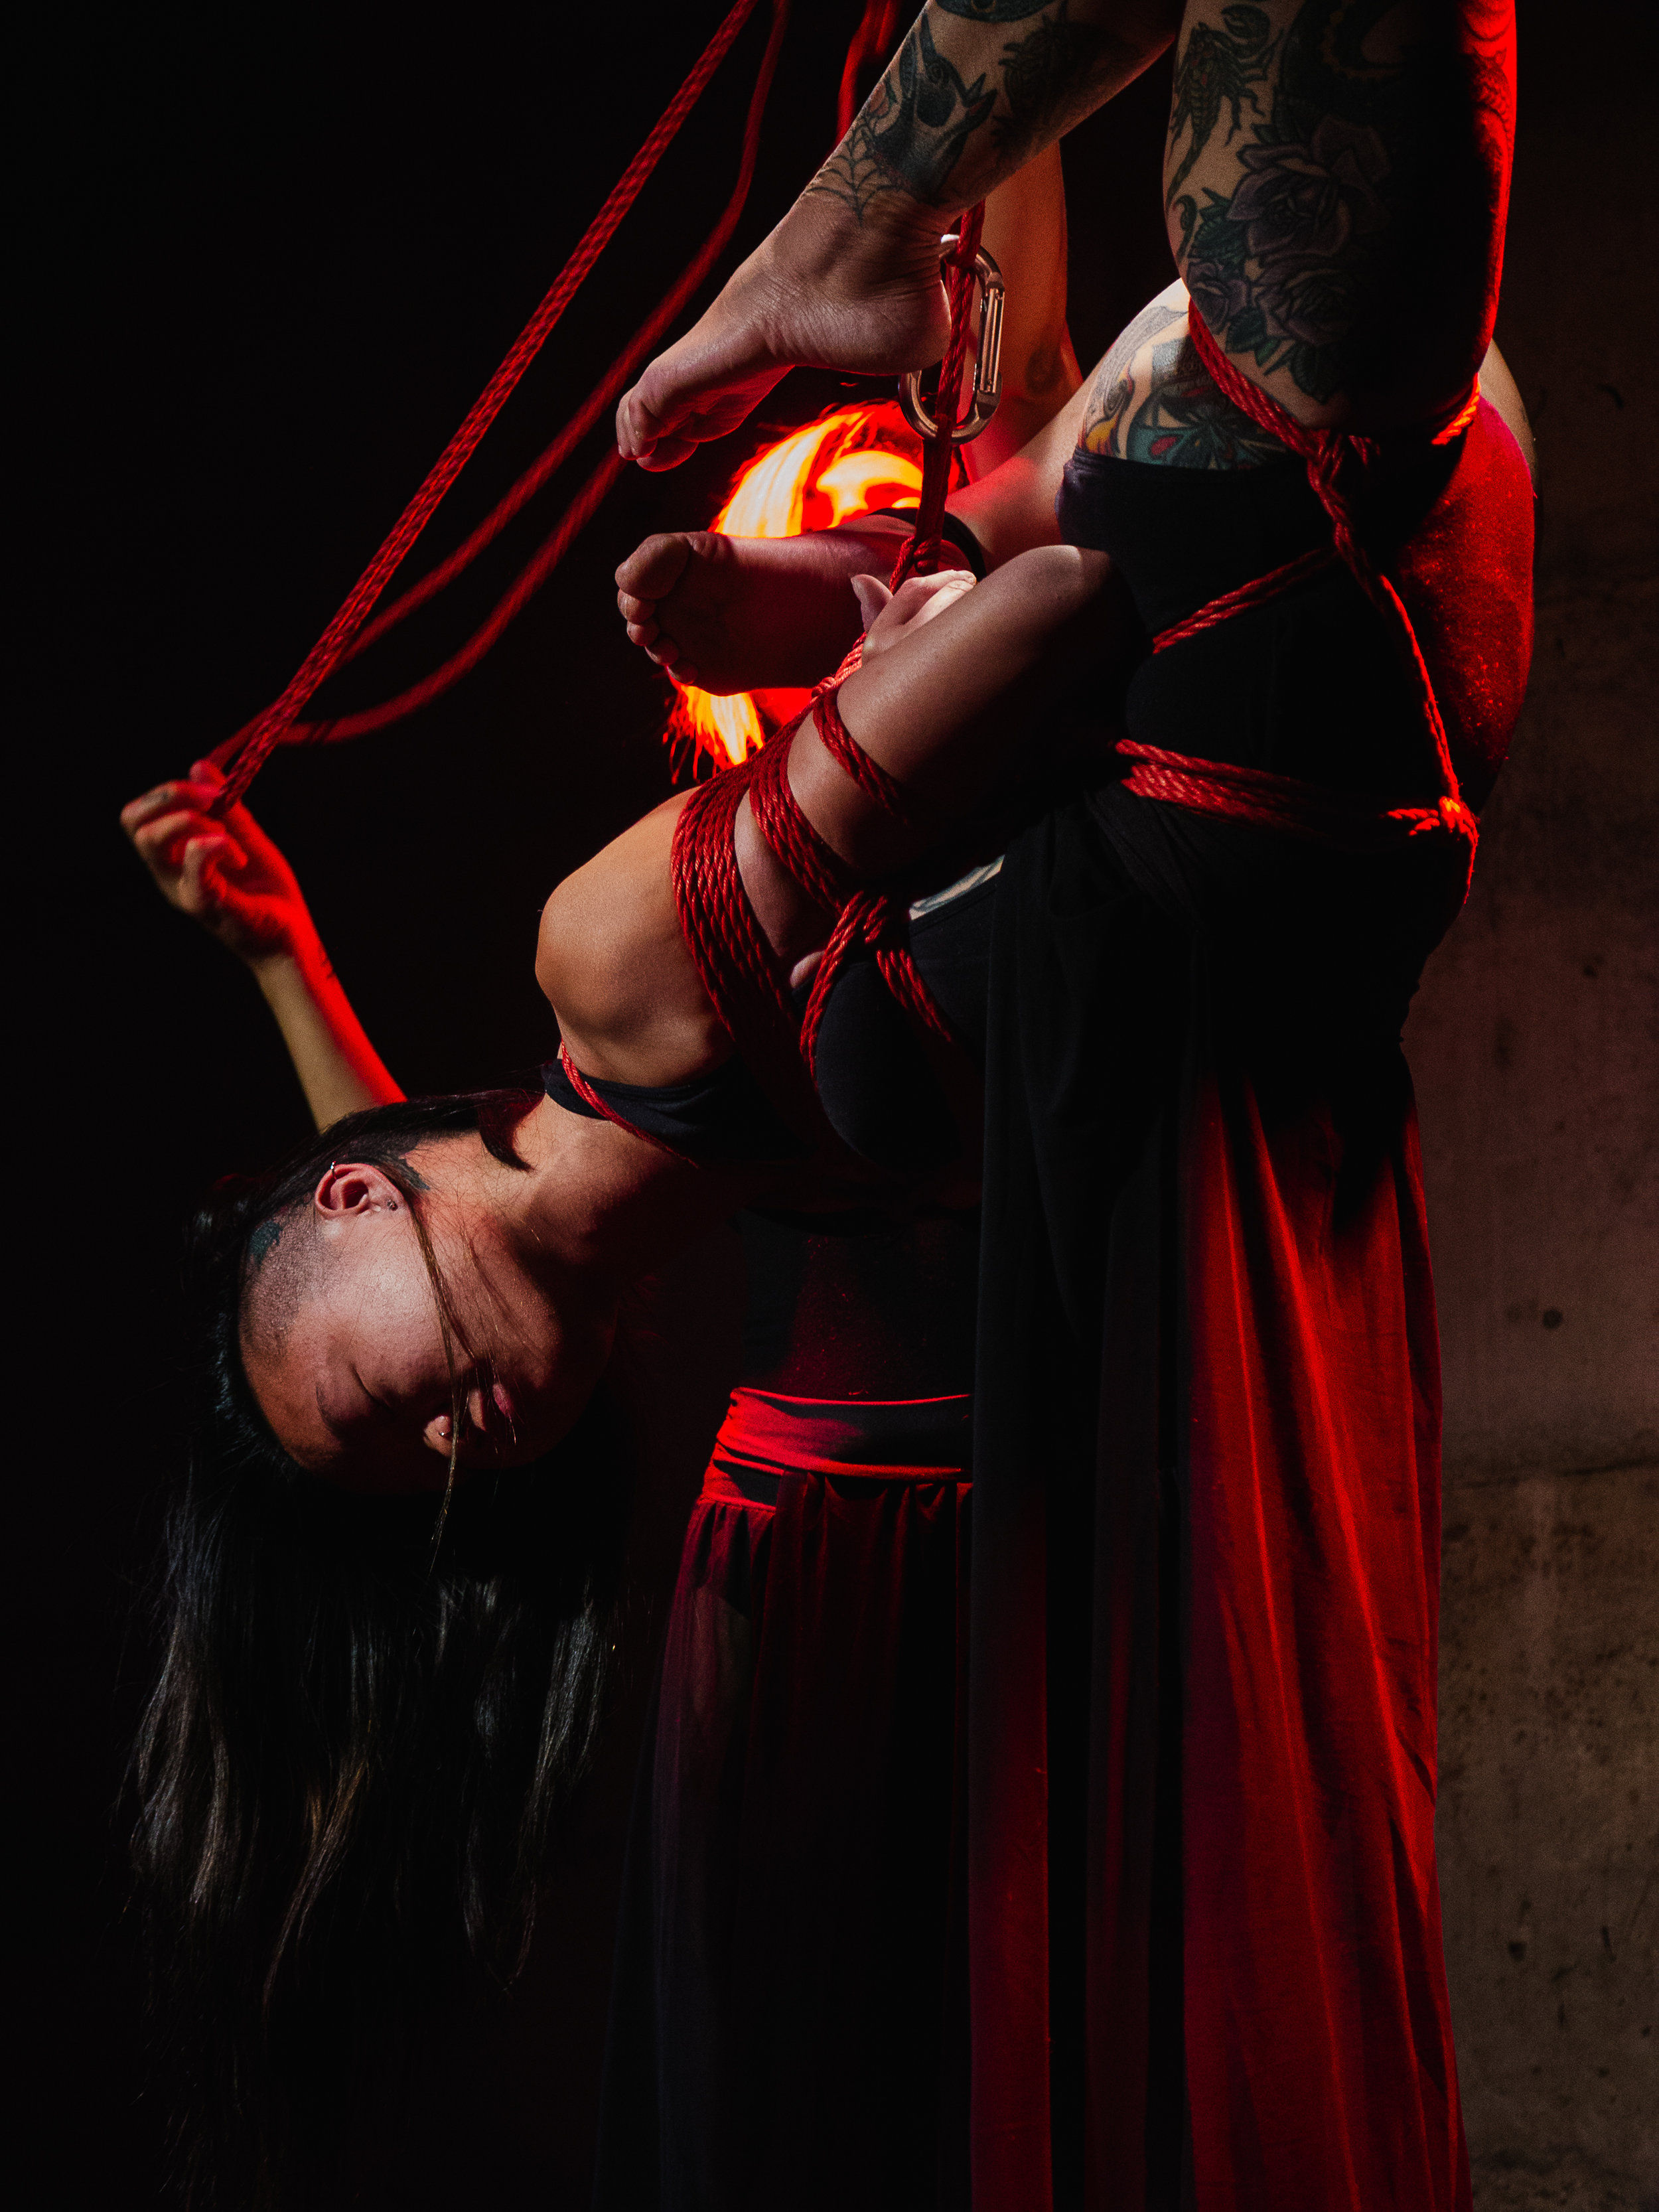 _2340485-MarcusLikesIt-MarikaLeïlaRoux-Performance-JustinWKing-Print.jpg